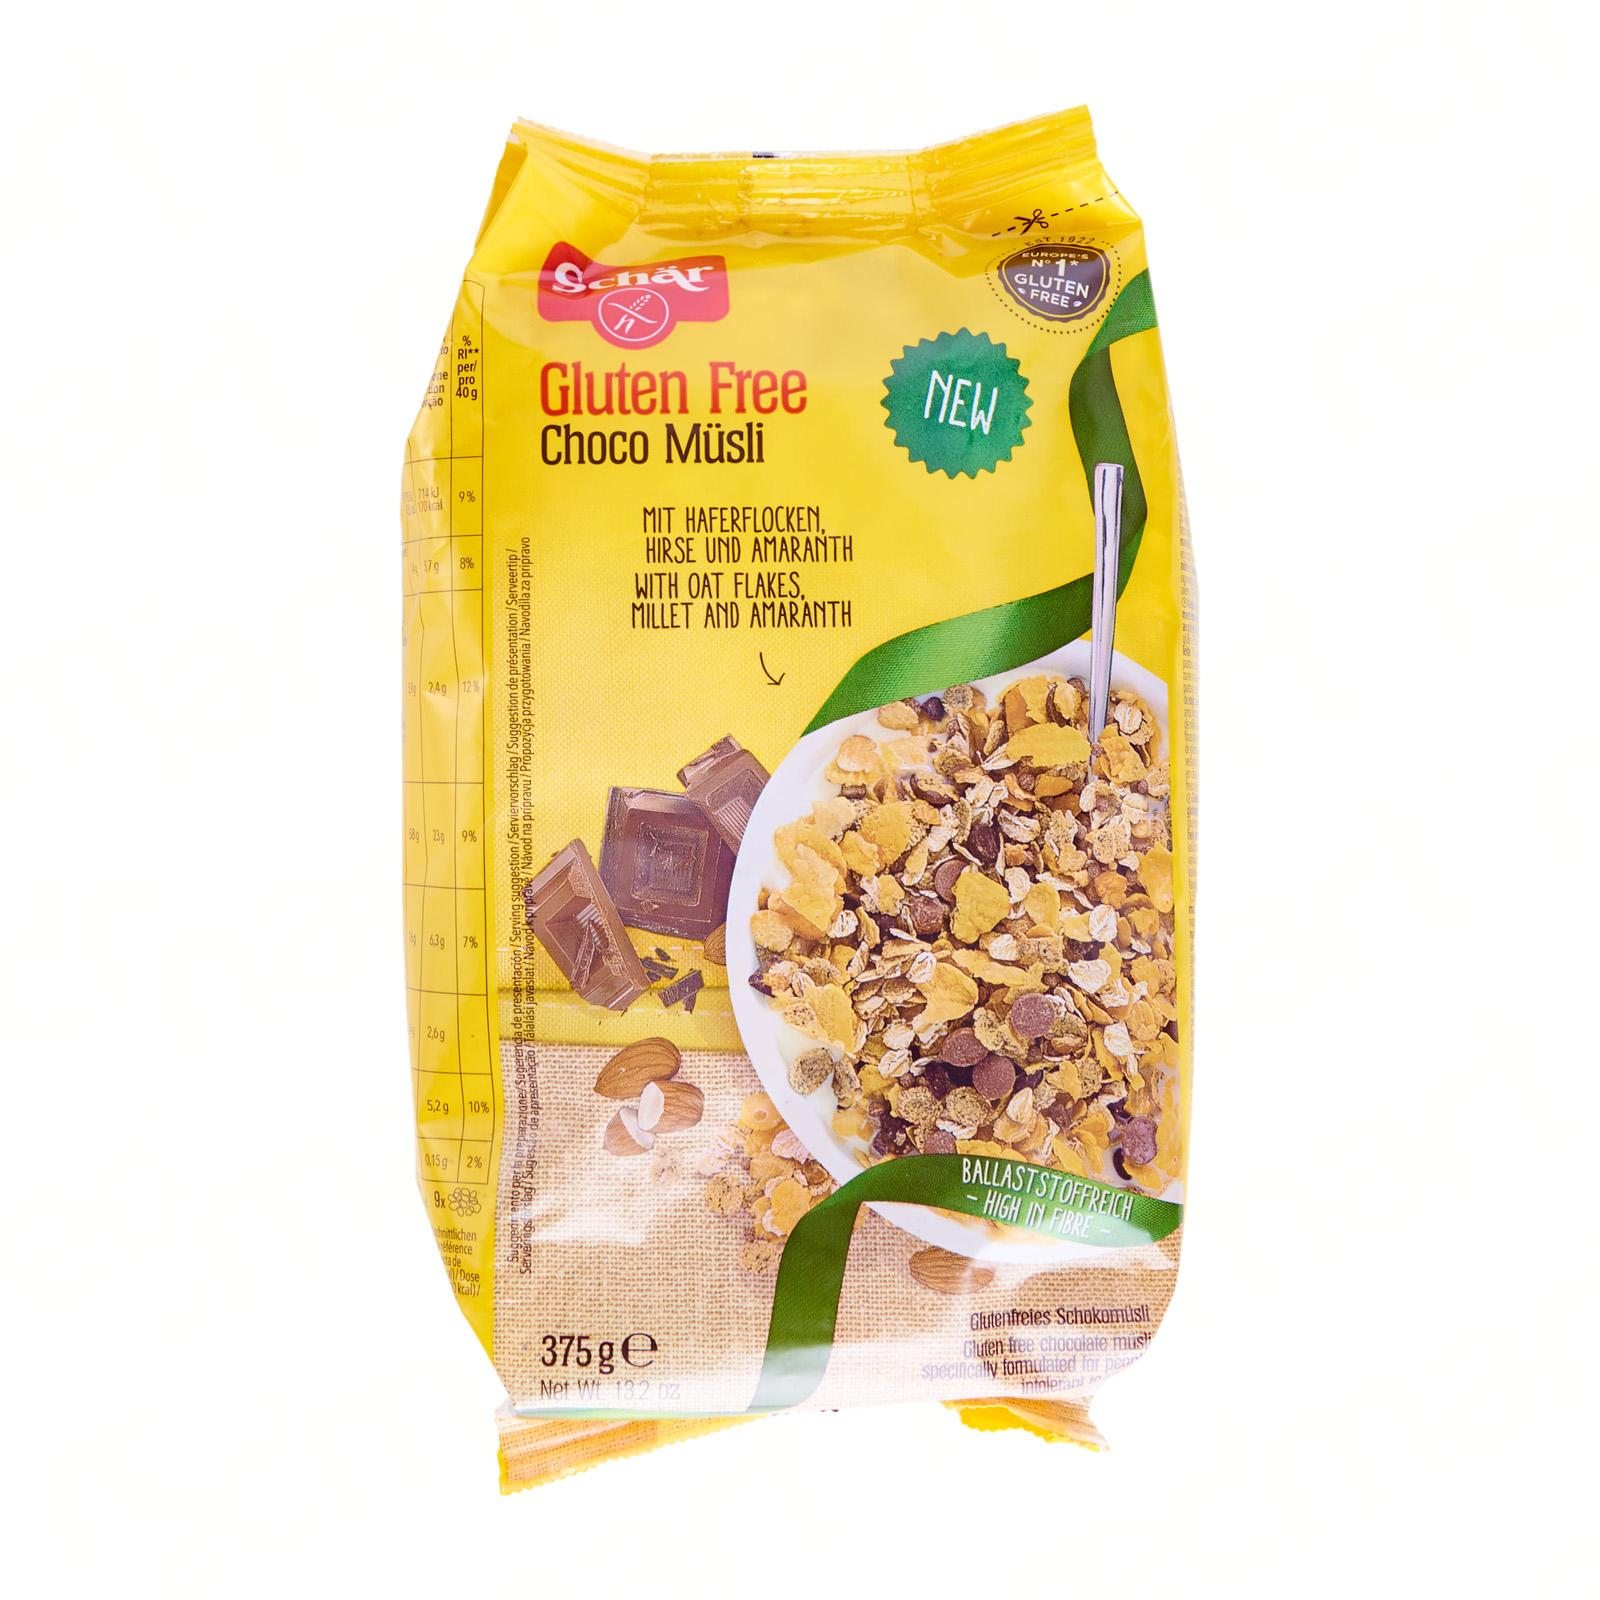 Dr. Schar Chocolate Muesli Gluten Free - By Agora Products